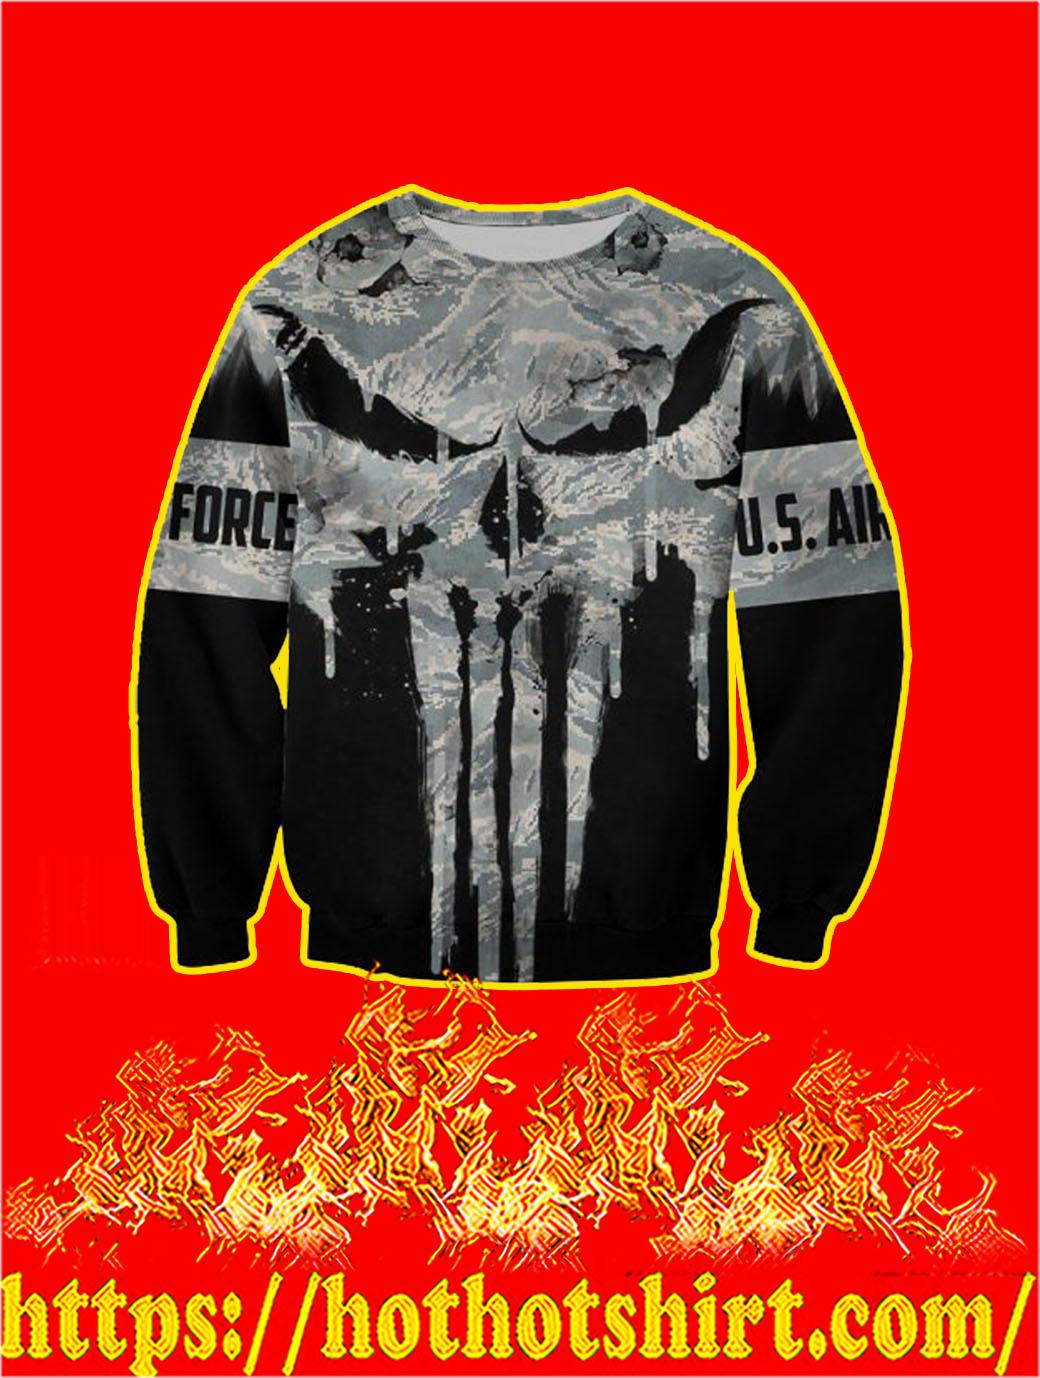 U.S Air Force Punisher Skull 3D Printed Sweatshirt